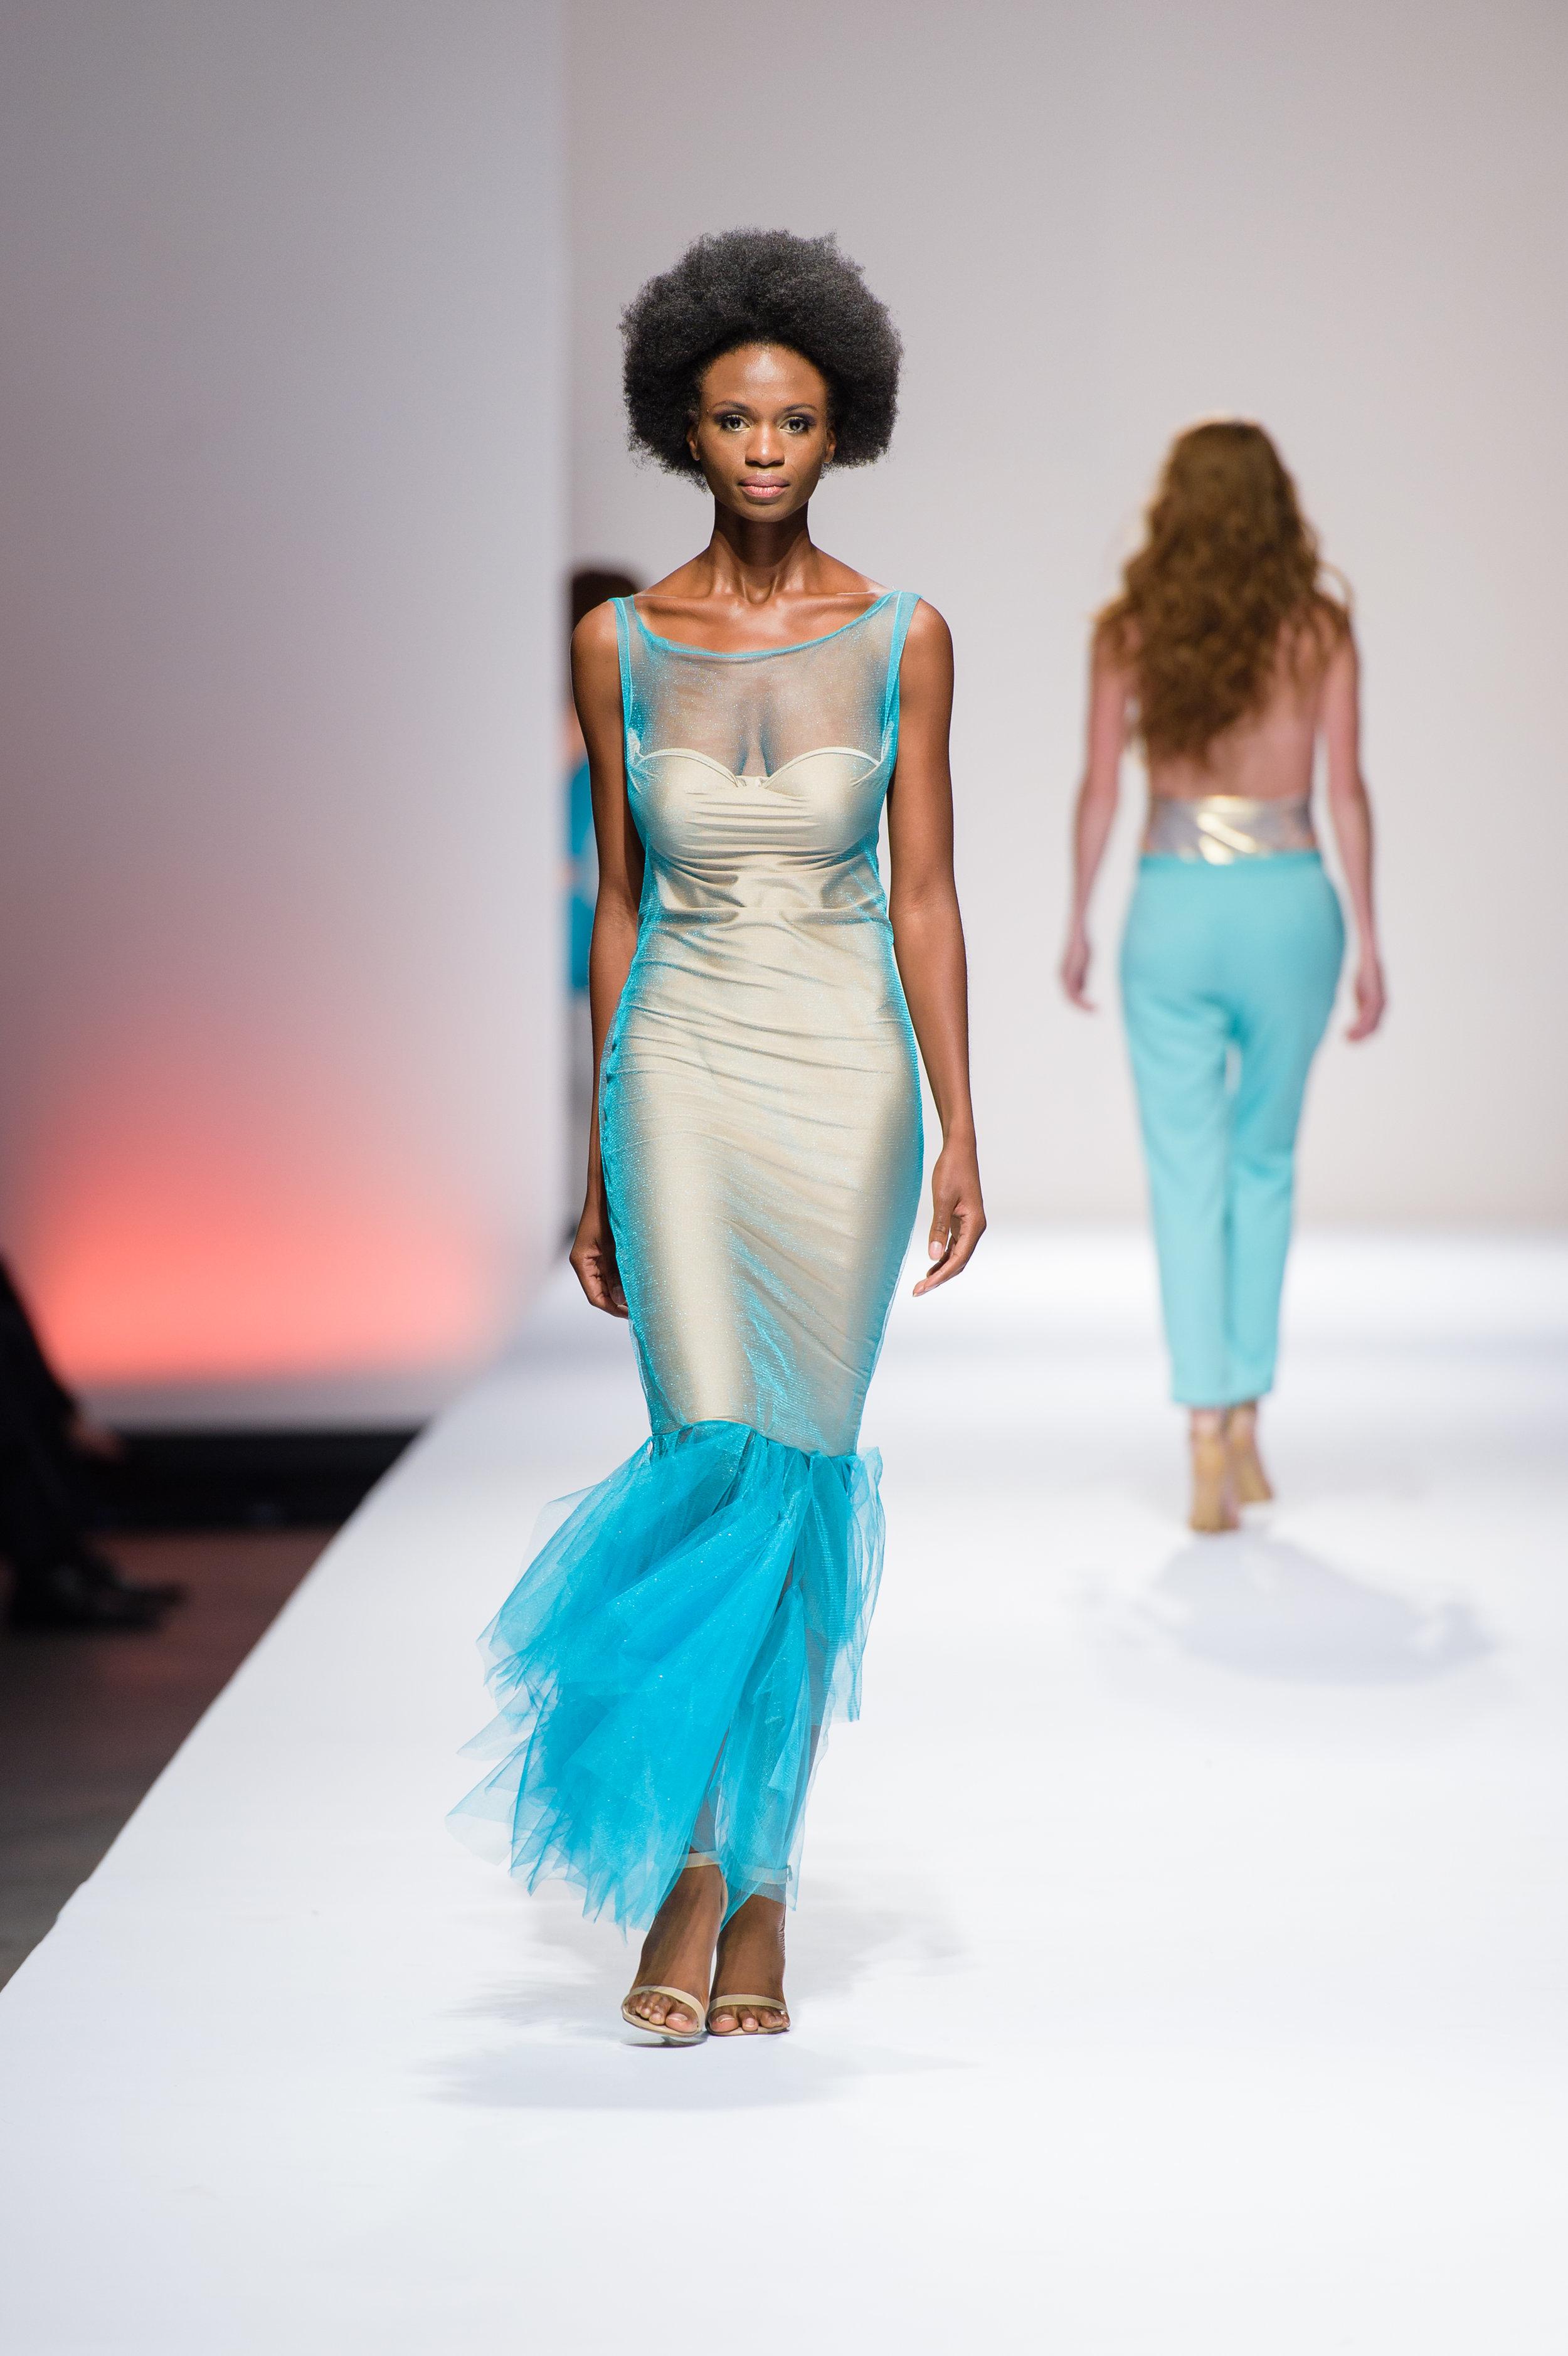 10142016-FashionXHouston-CarlosBarron-0314.jpg